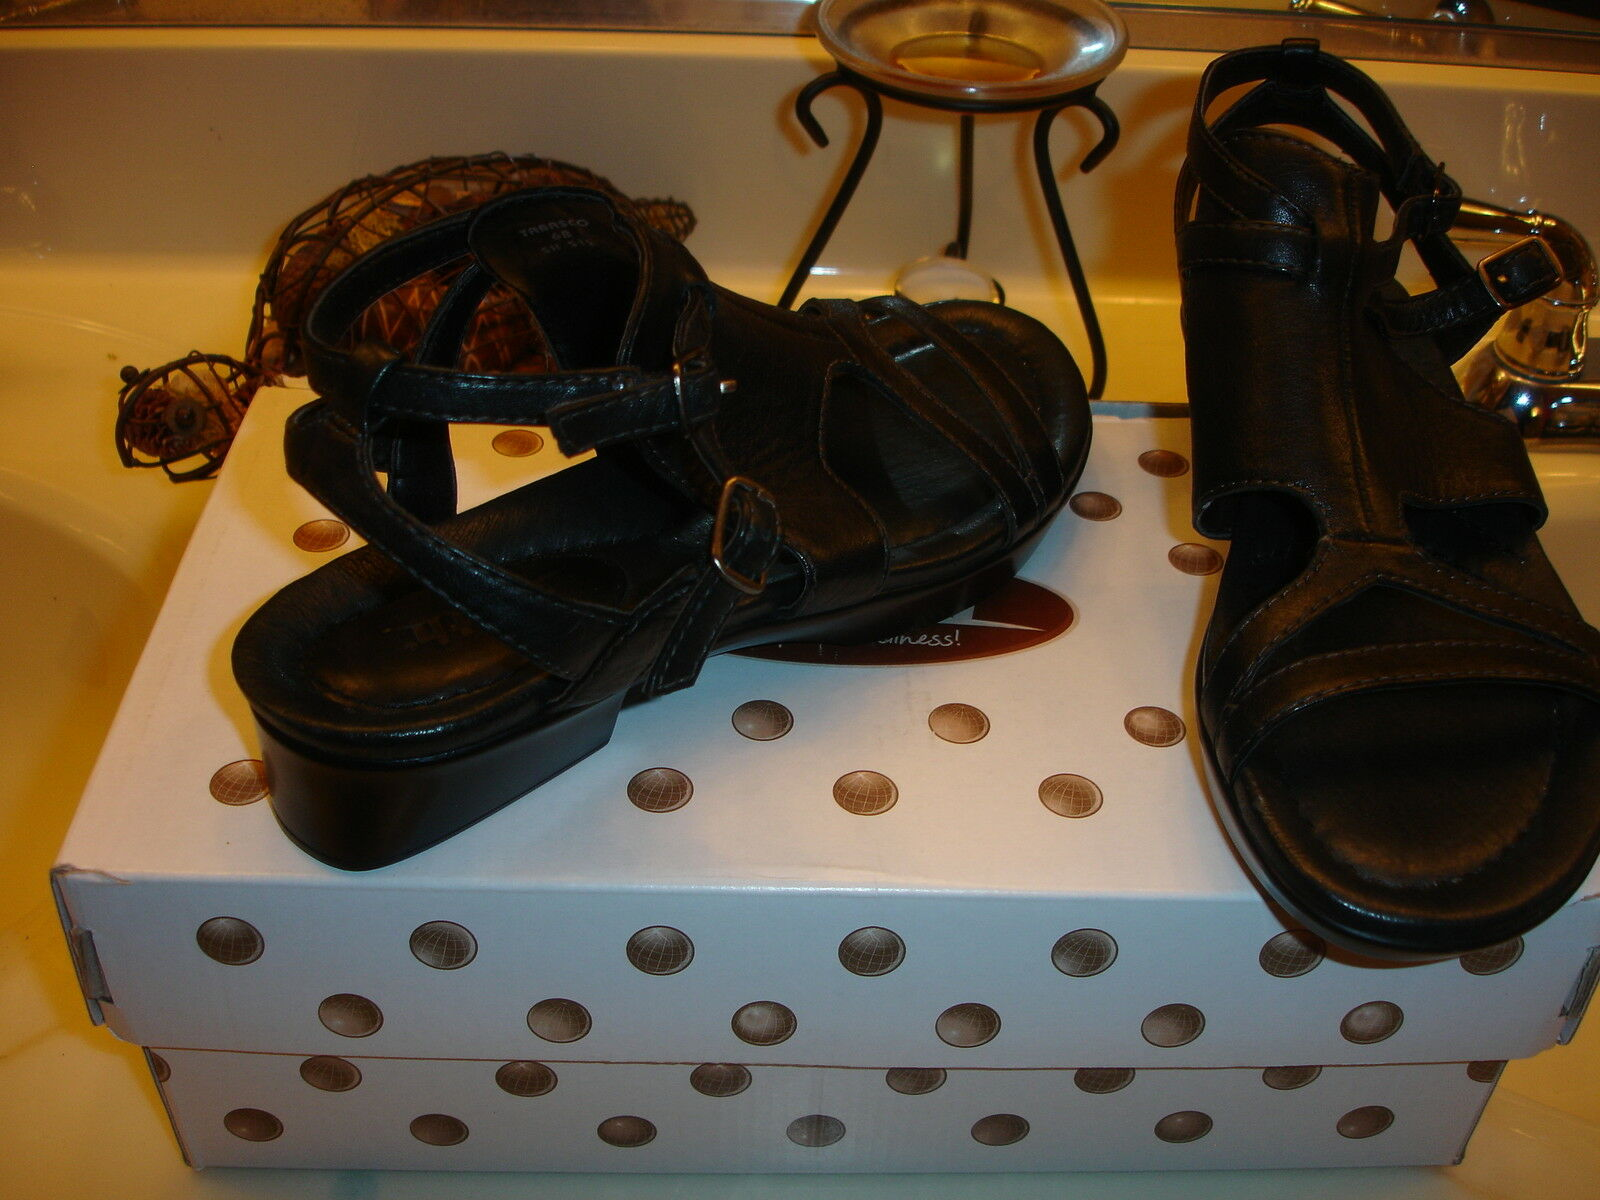 Earth Tabasco nero Leather Mooshie Calf Comfort Comfort Comfort Sandal Styllish Quality  99 6 2b5b93